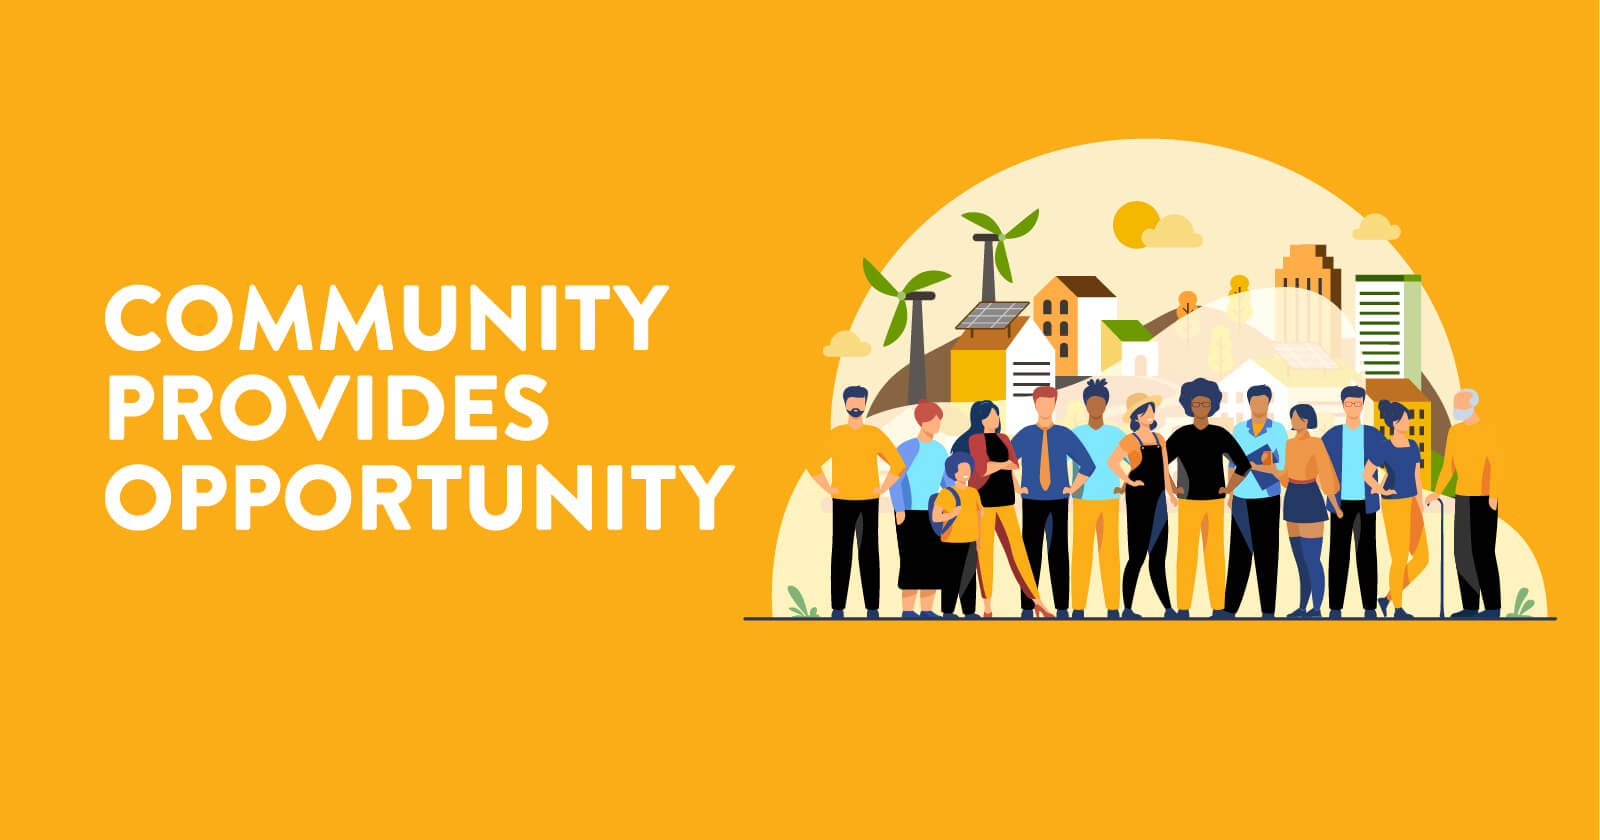 Community provides opportunity